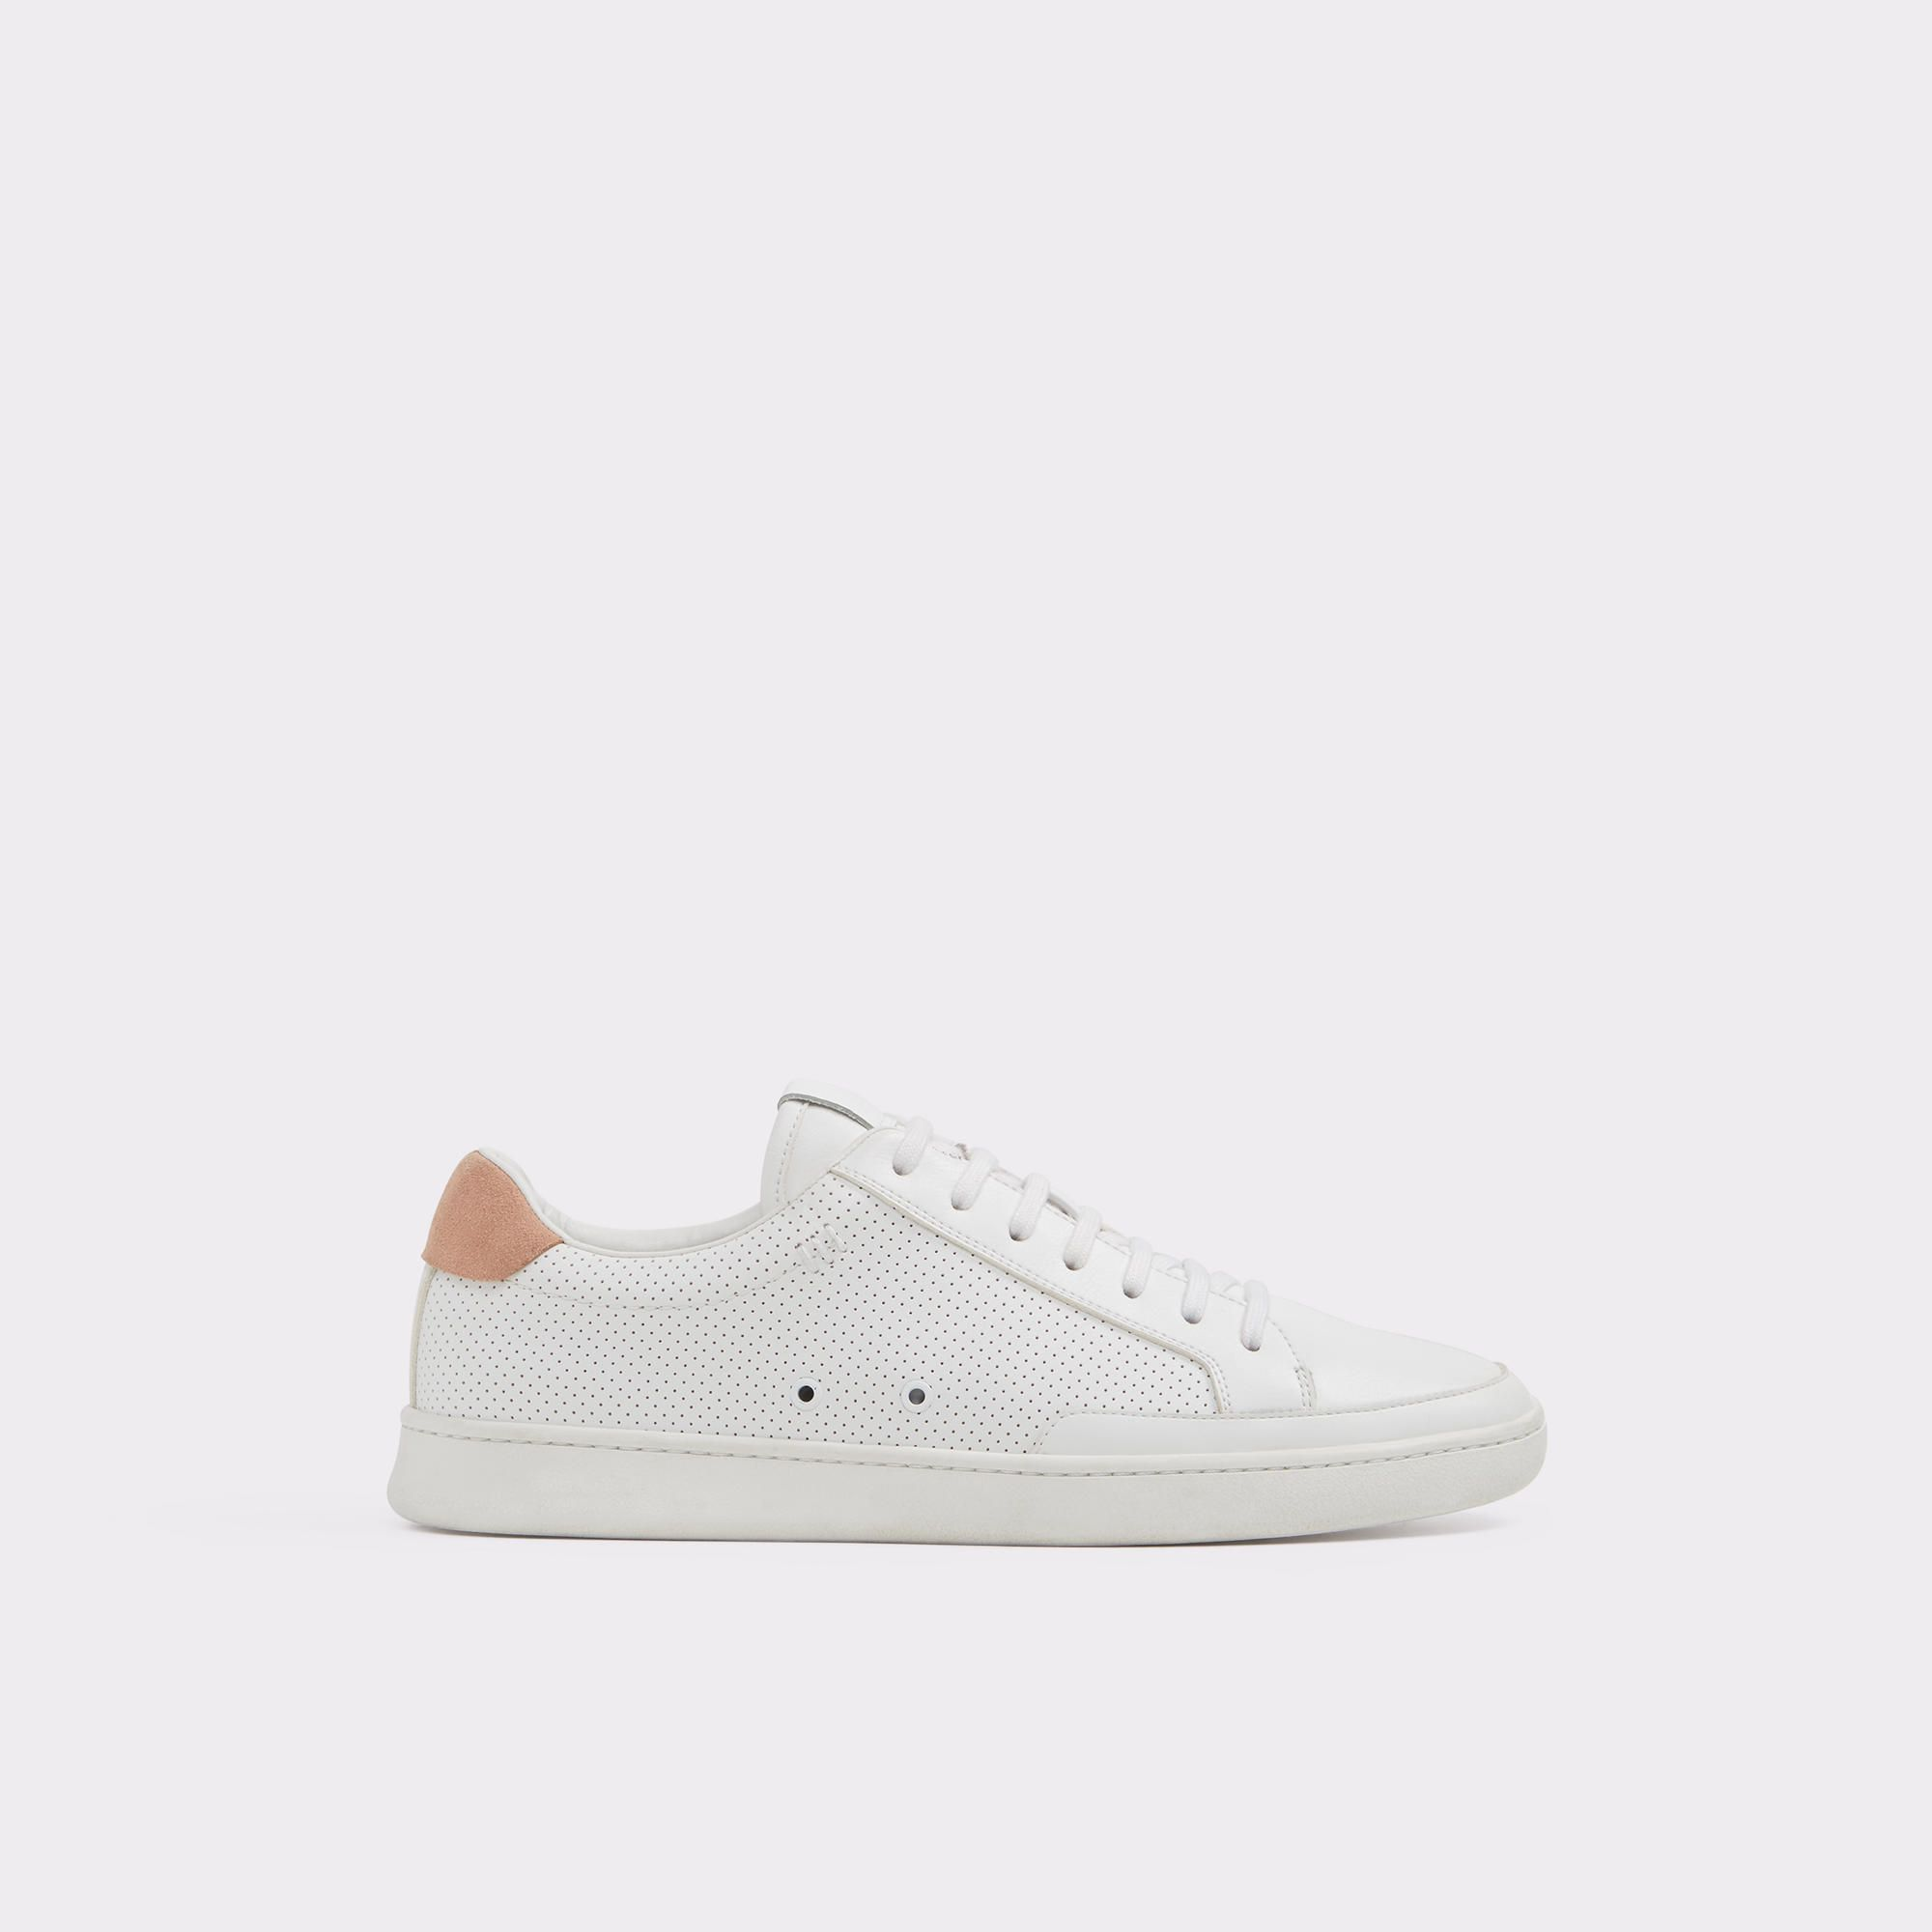 Sneakers men, Sneakers, Sneakers fashion